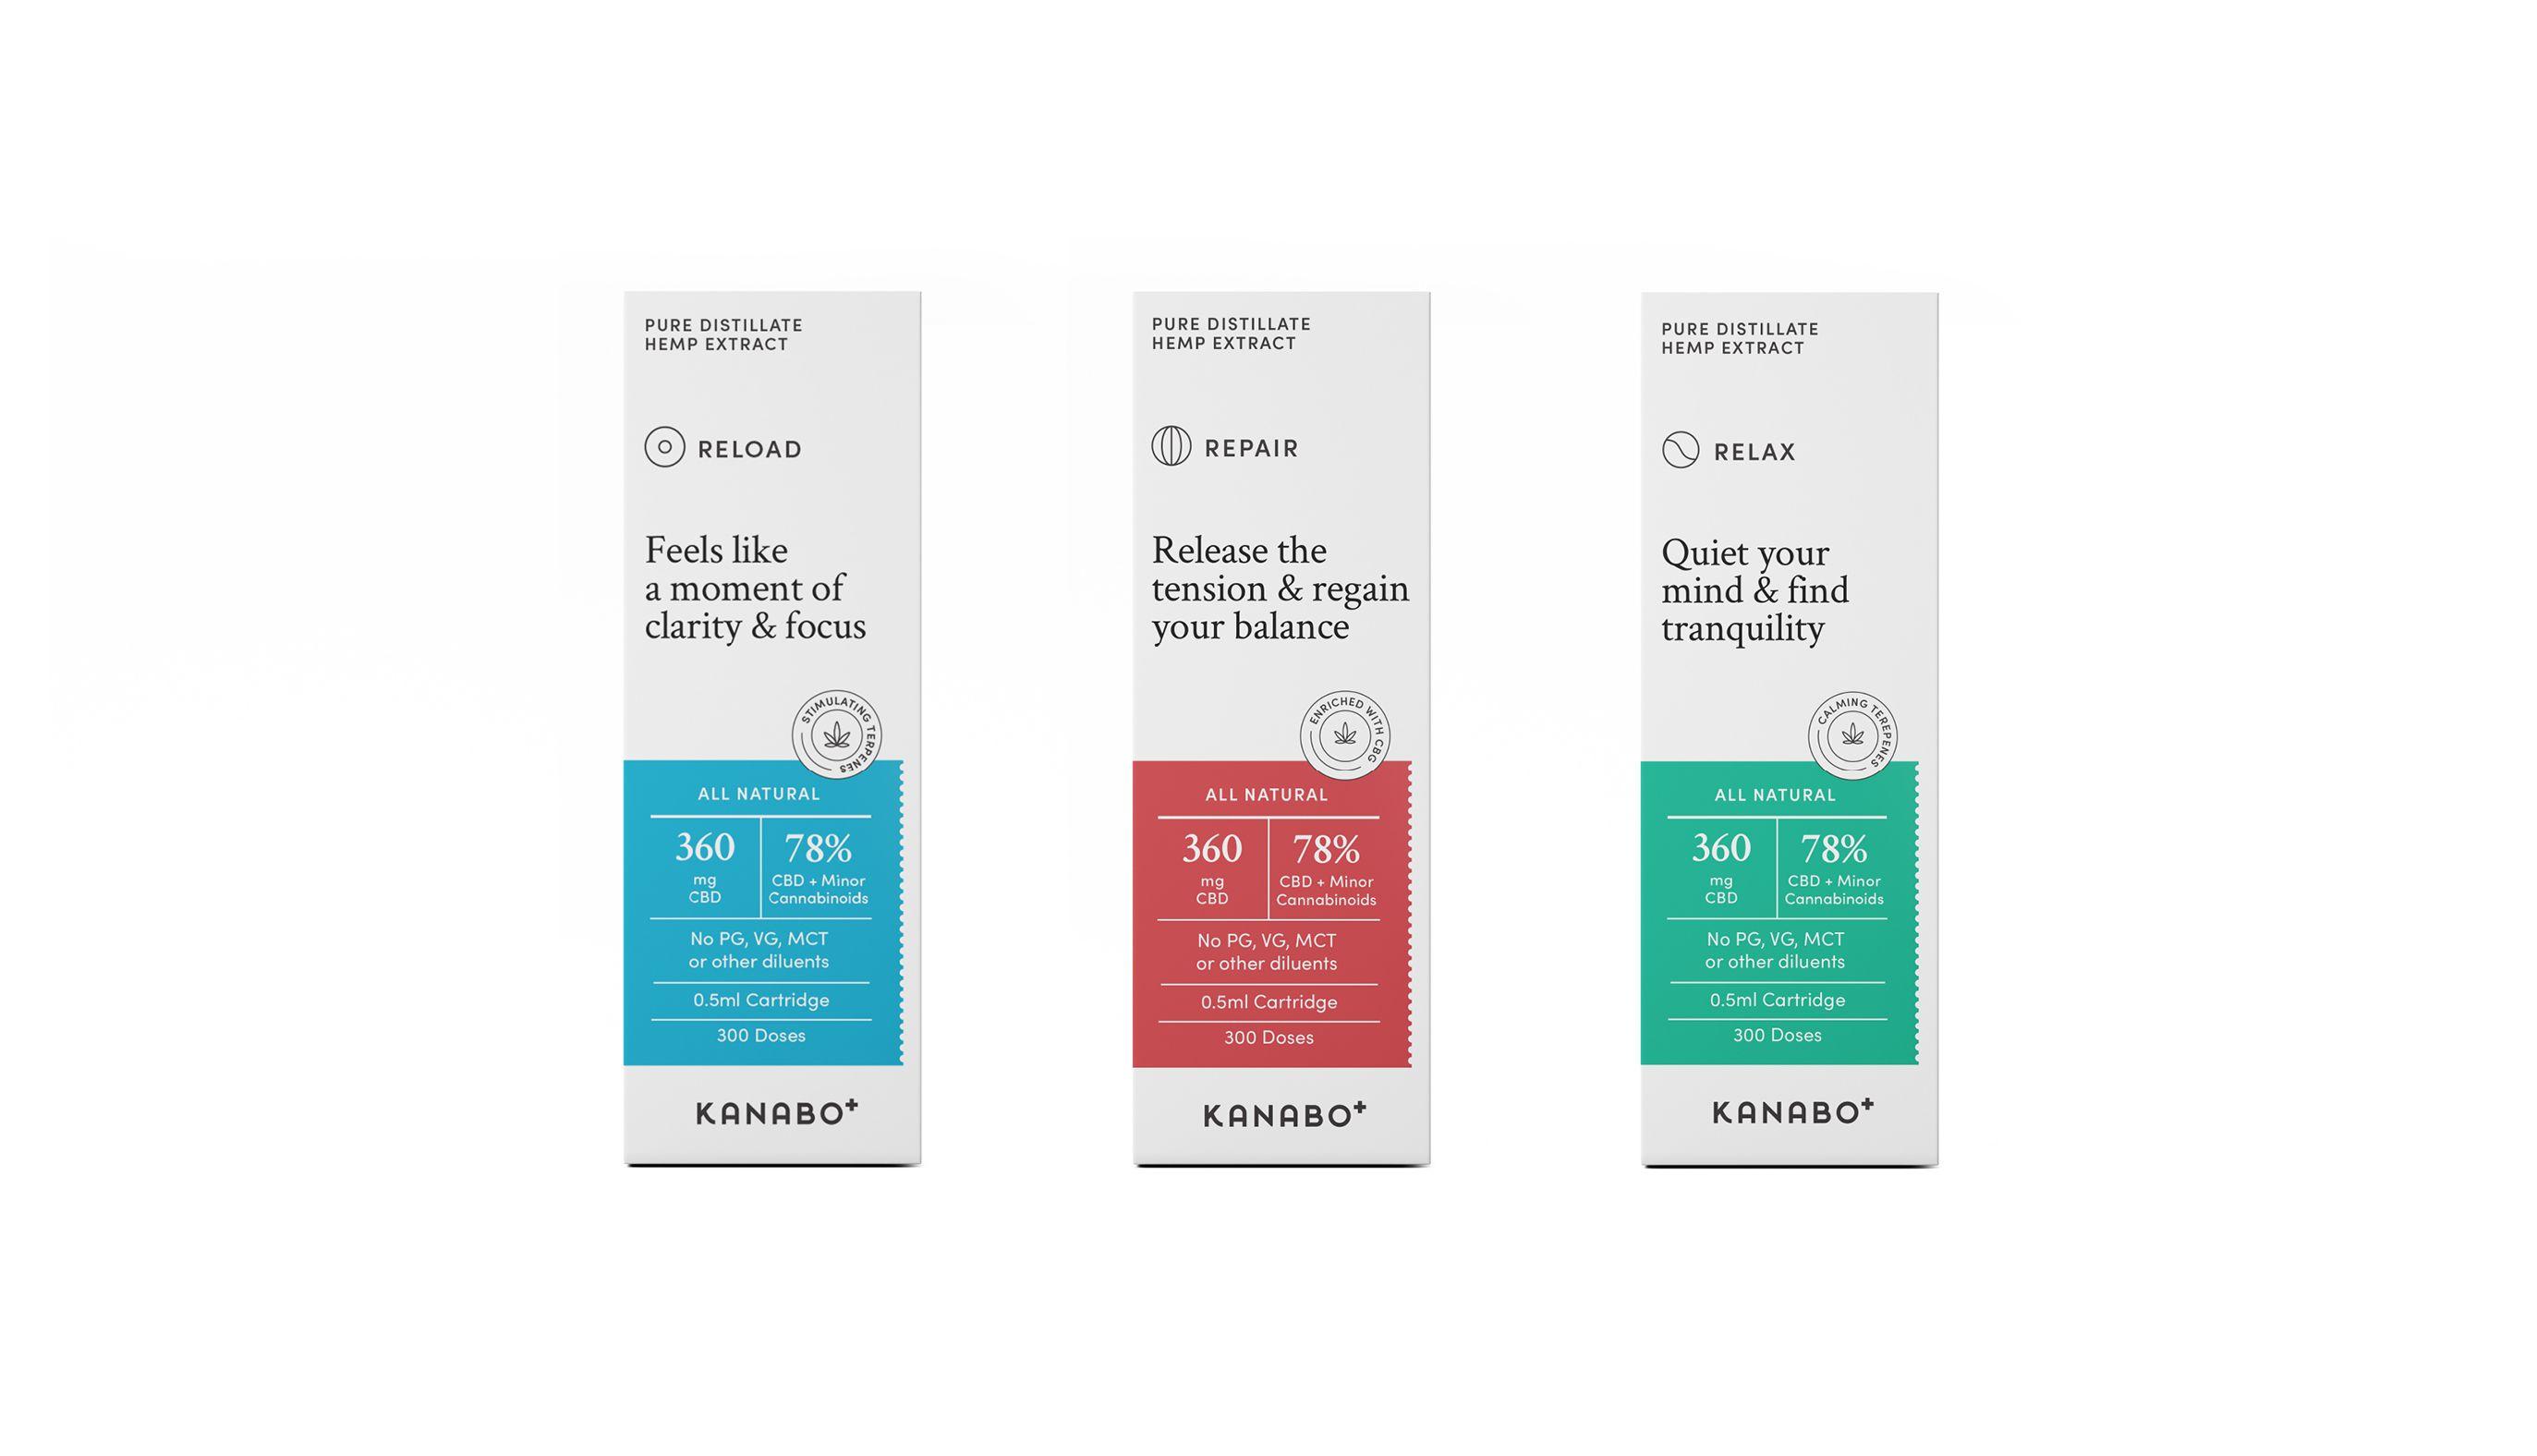 Kanabo packaging